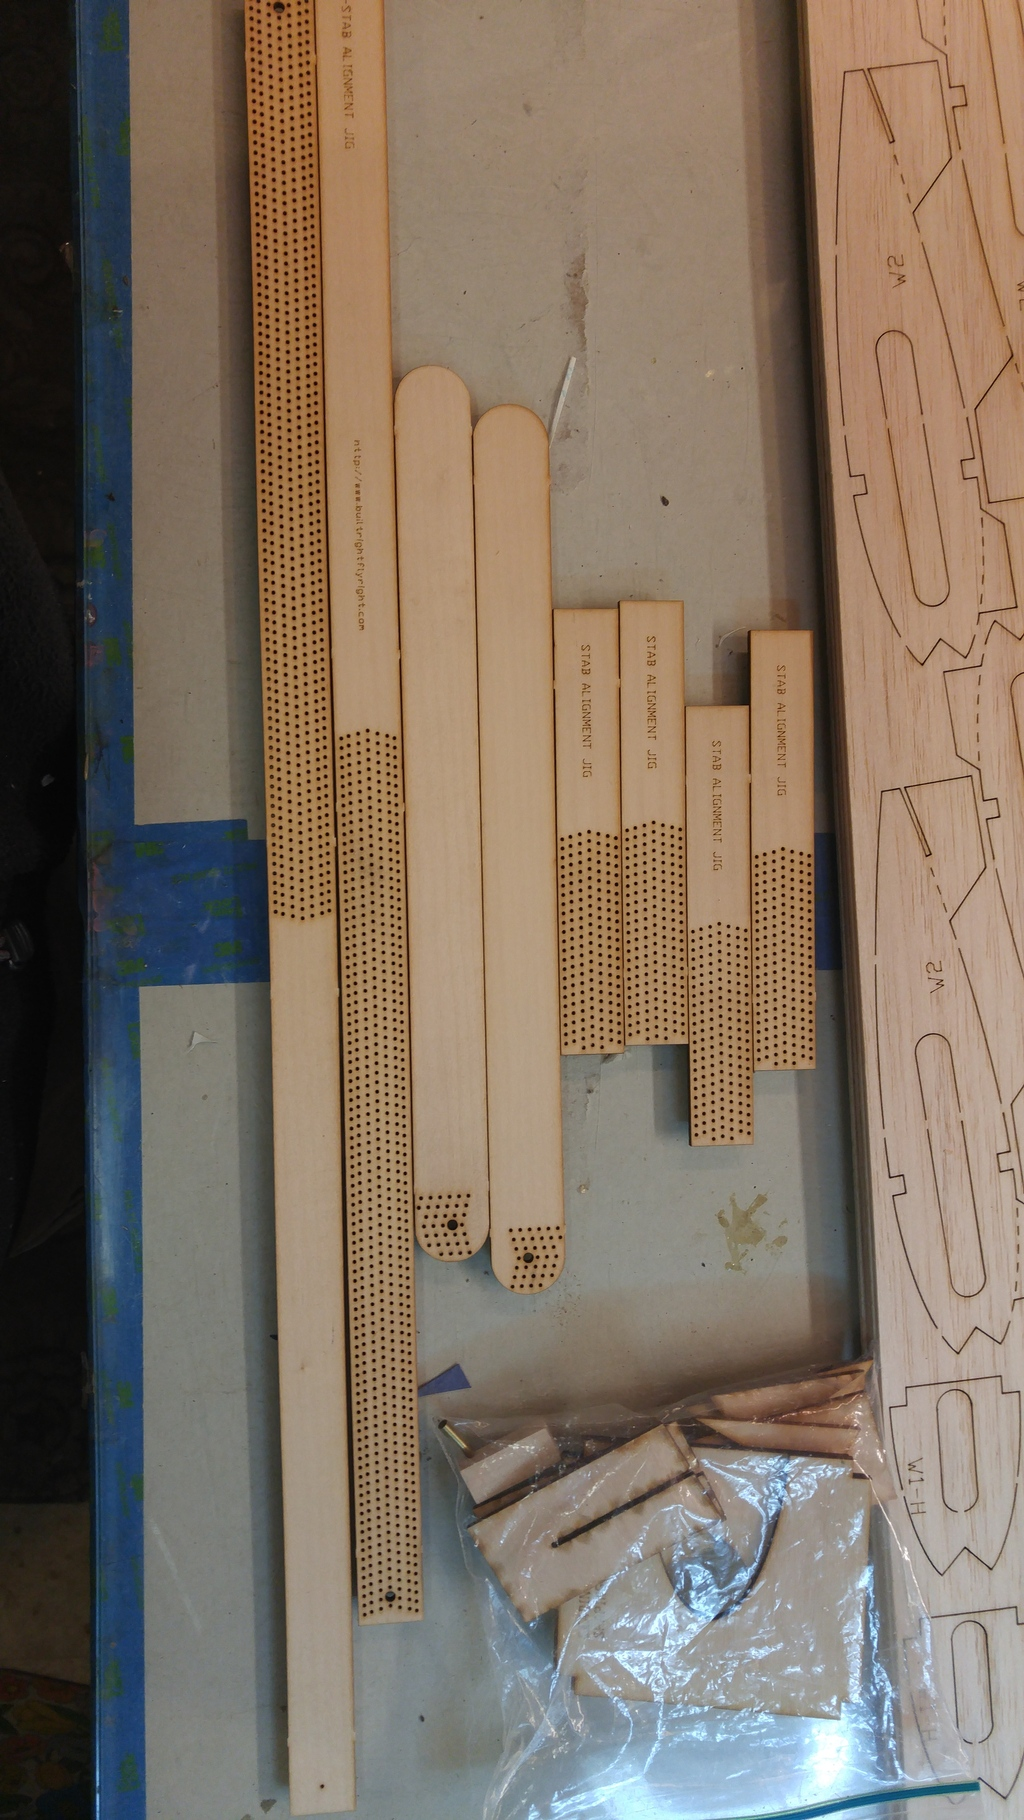 My Fancherized Twister build; 3 days til Huntersville 1031151441_zps83995mgs